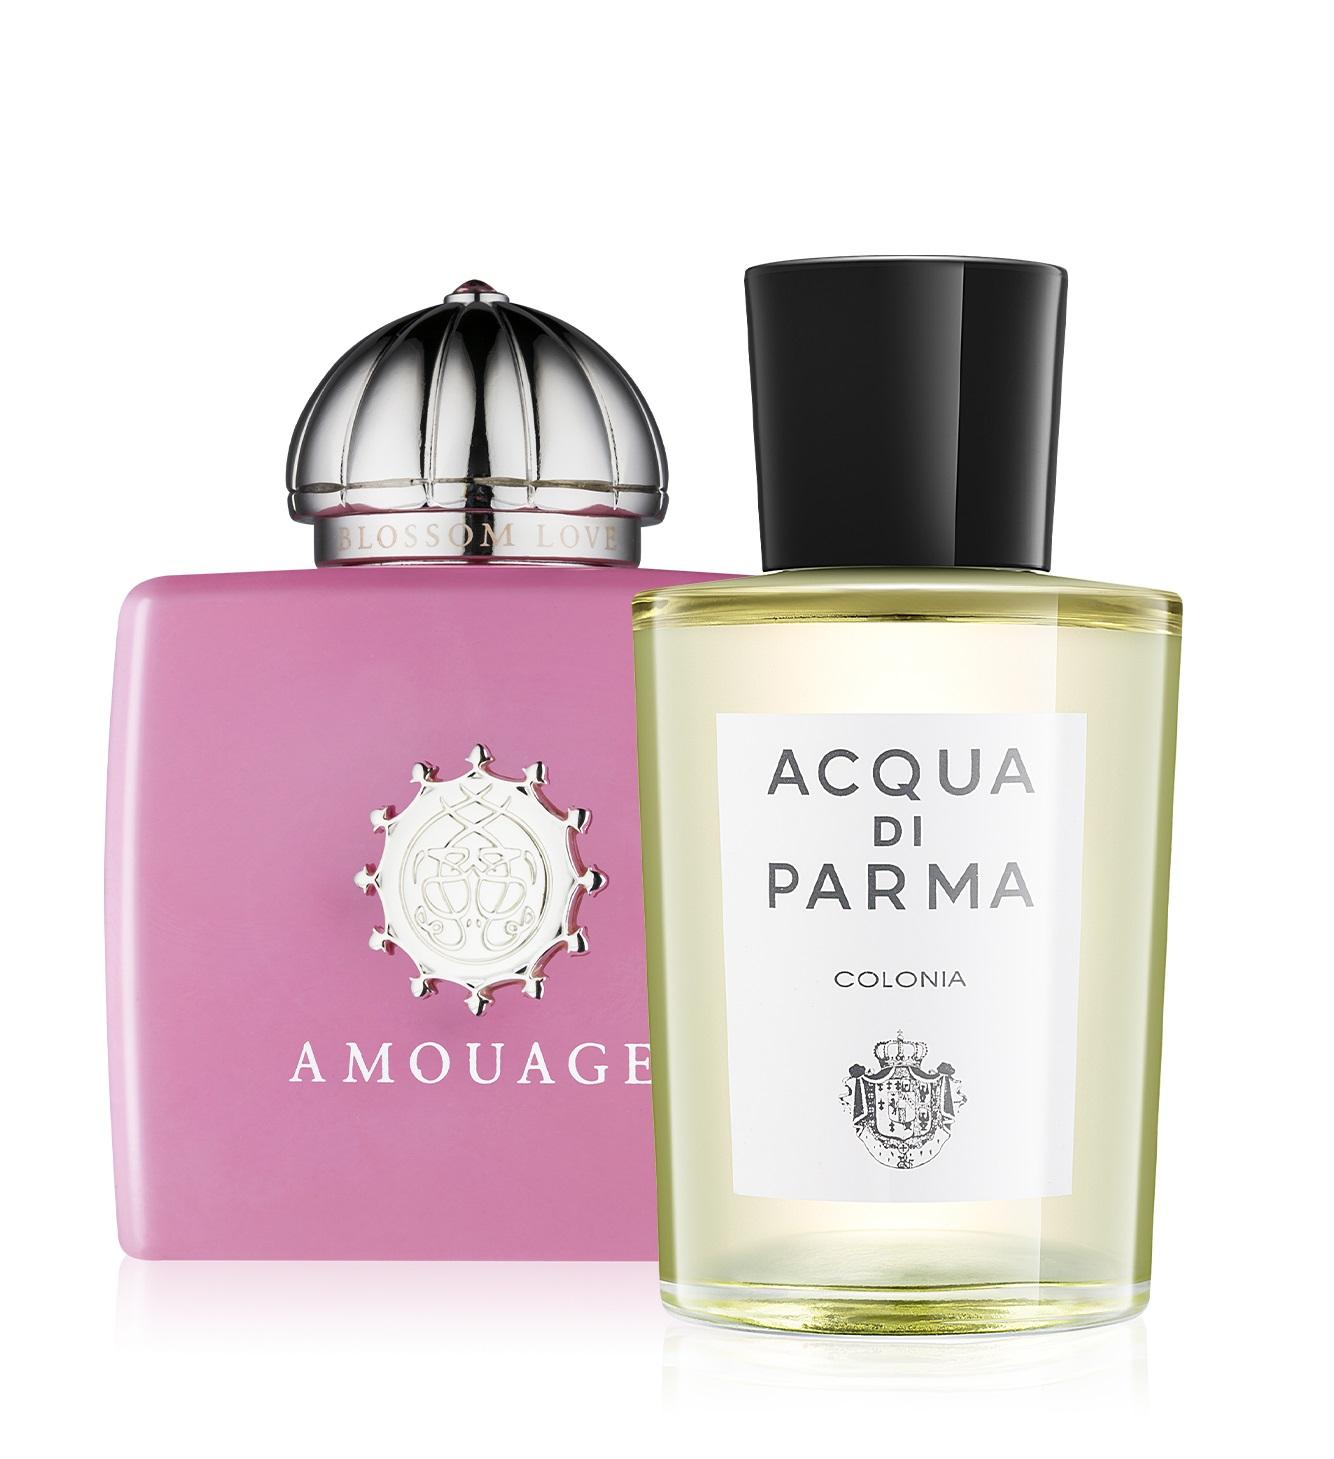 Legjobb niche parfüm